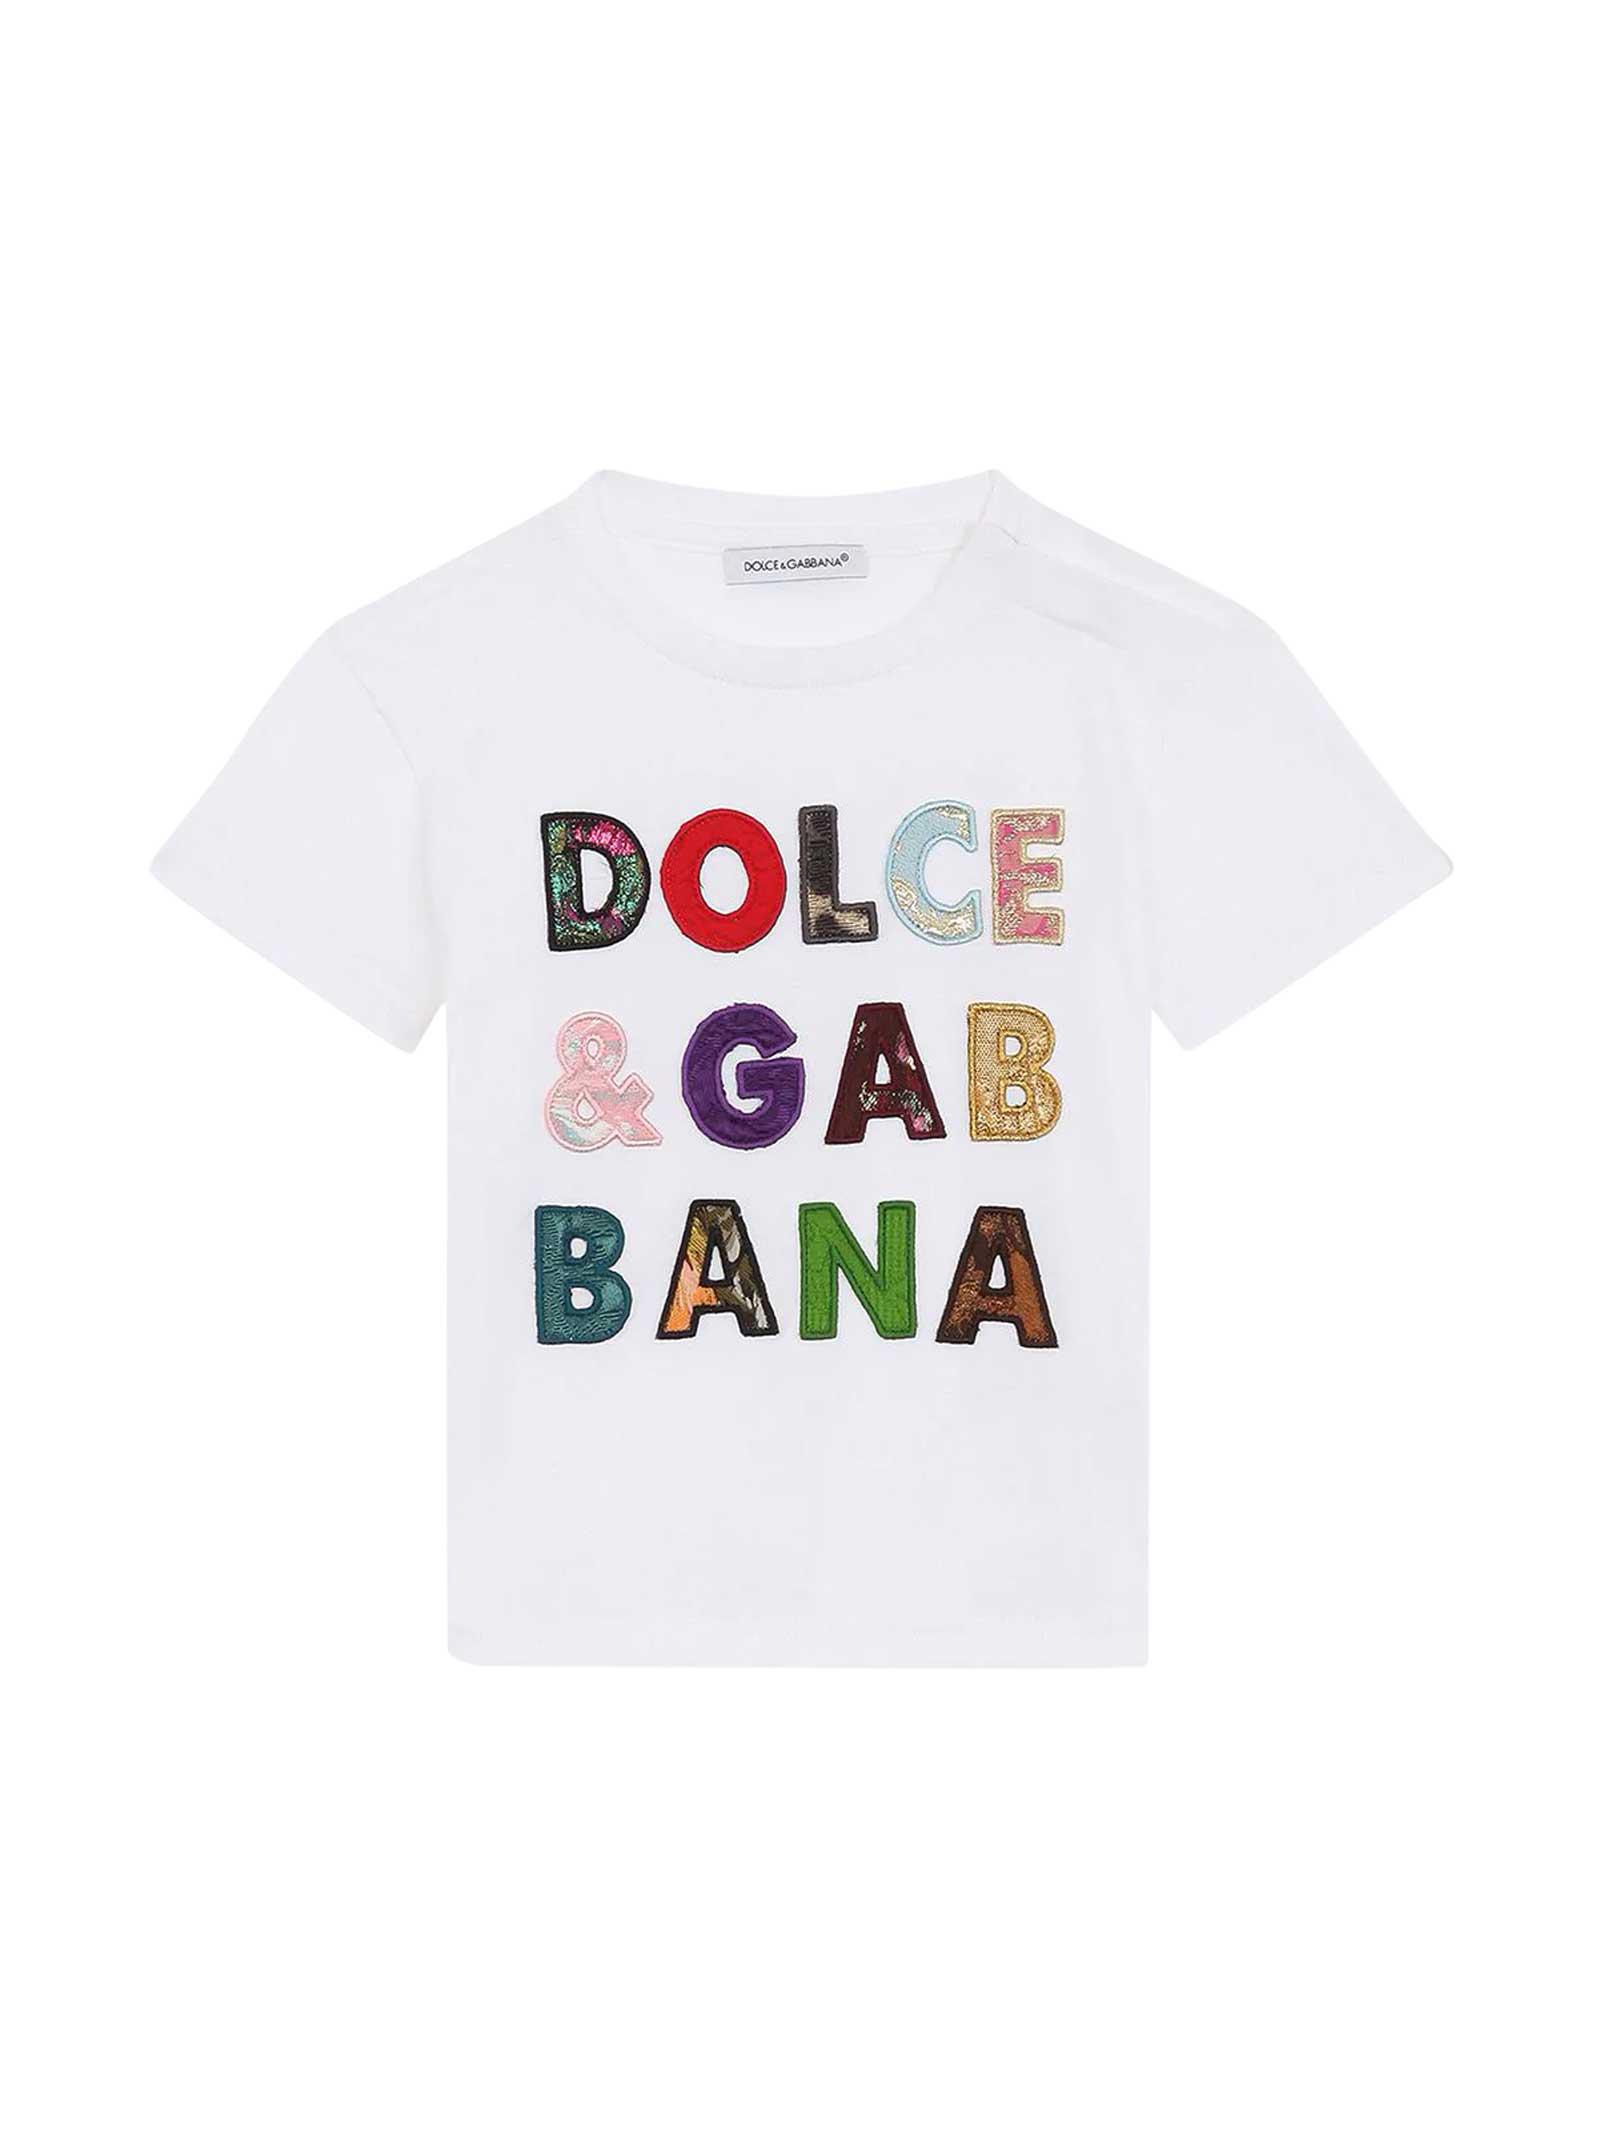 Dolce & Gabbana WHITE BABY T-SHIRT